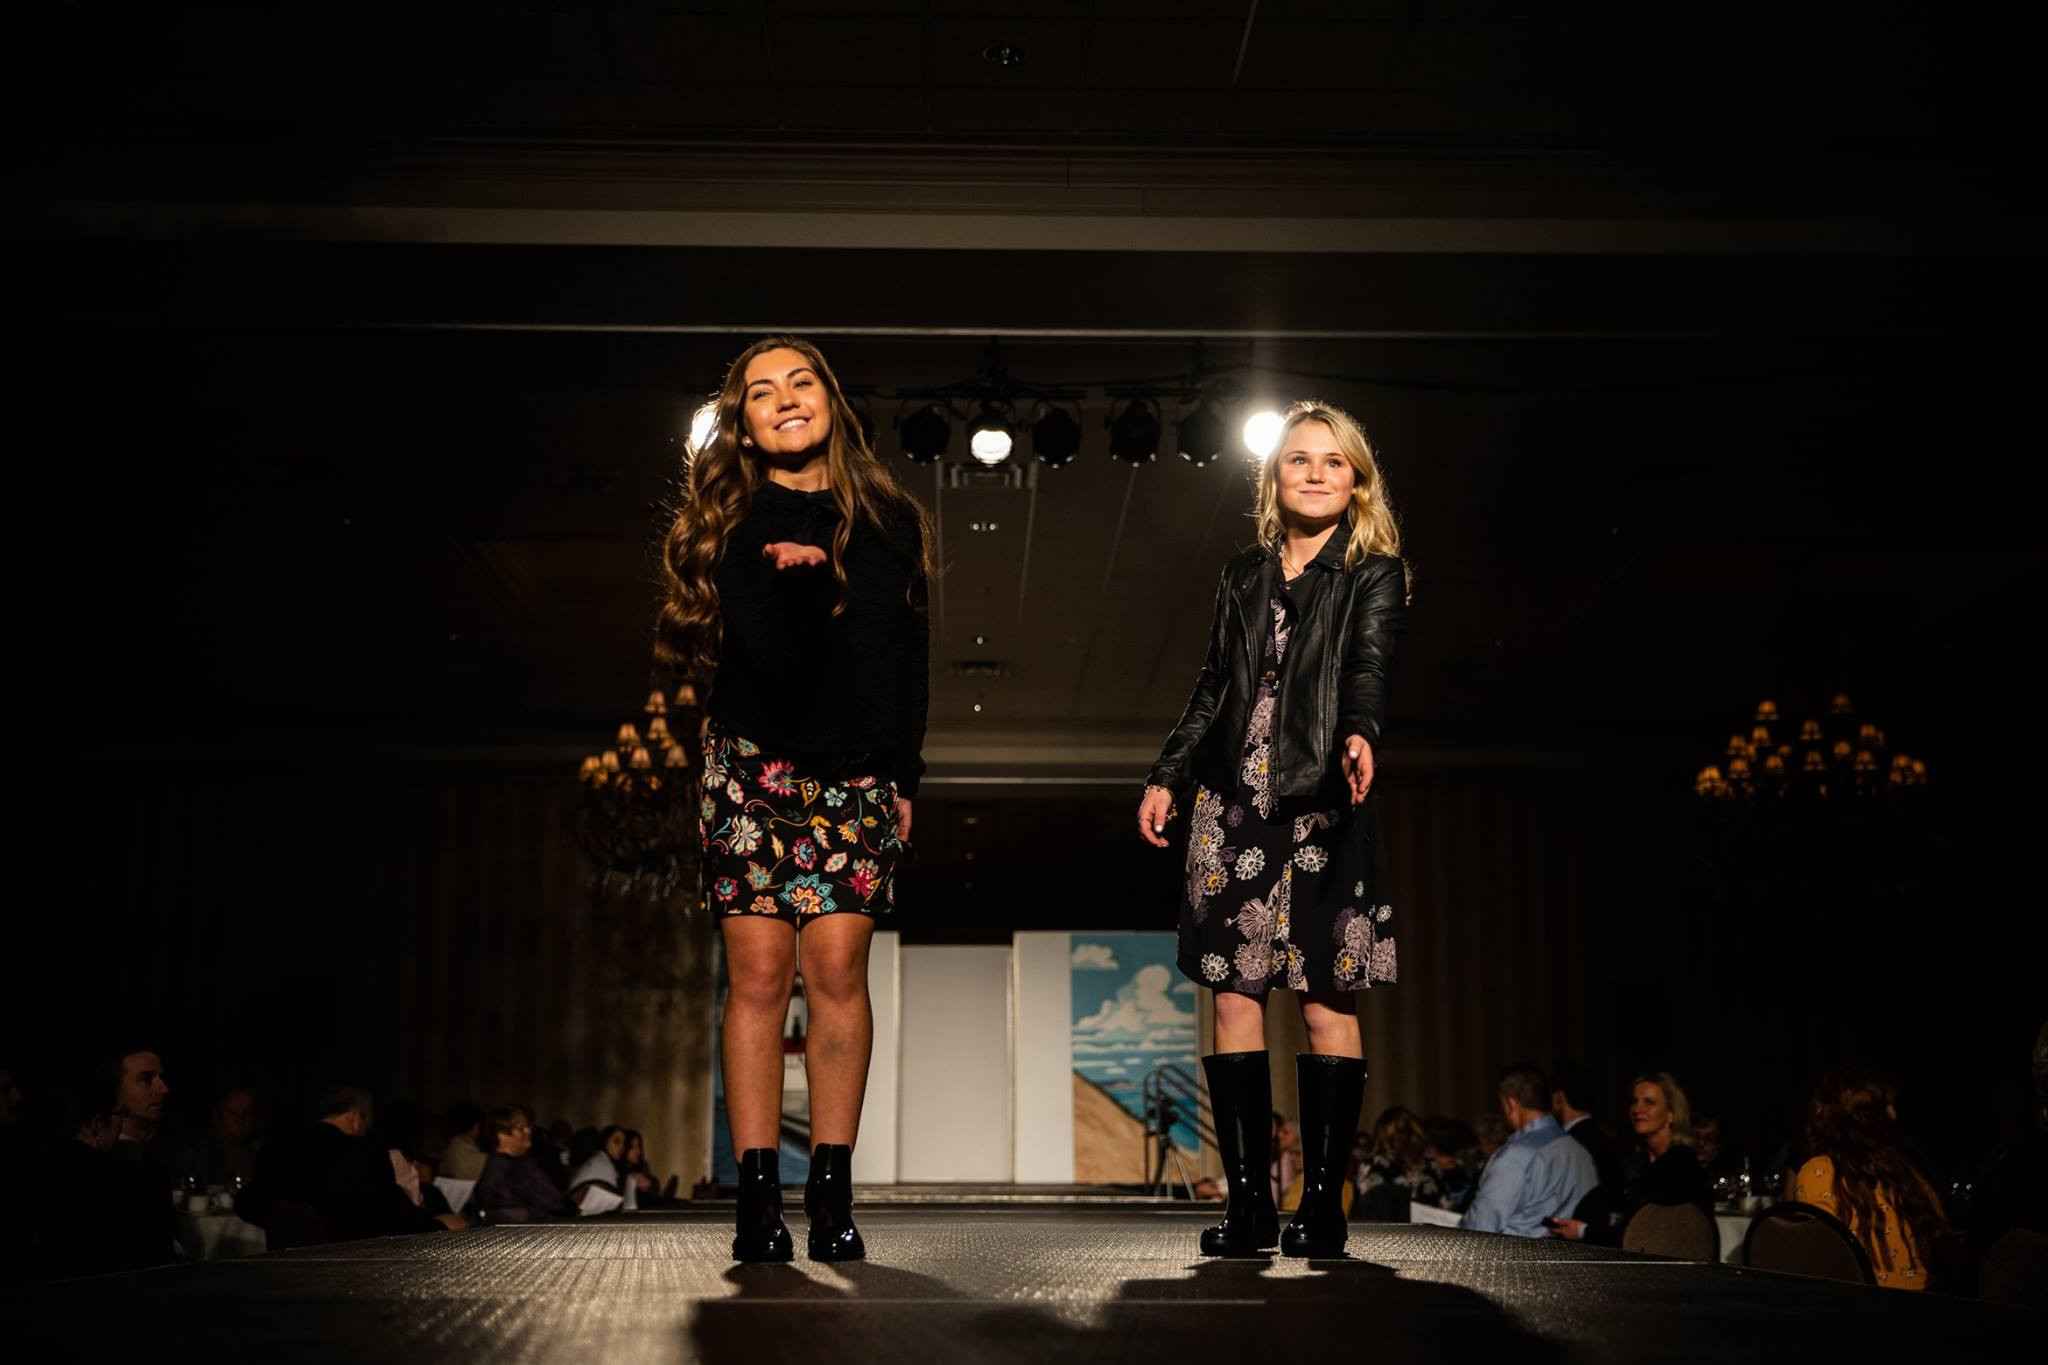 Lutheran_North_High_School_Macomb_Michigan_LHN_Fashion_Show_2019 (5).jpg